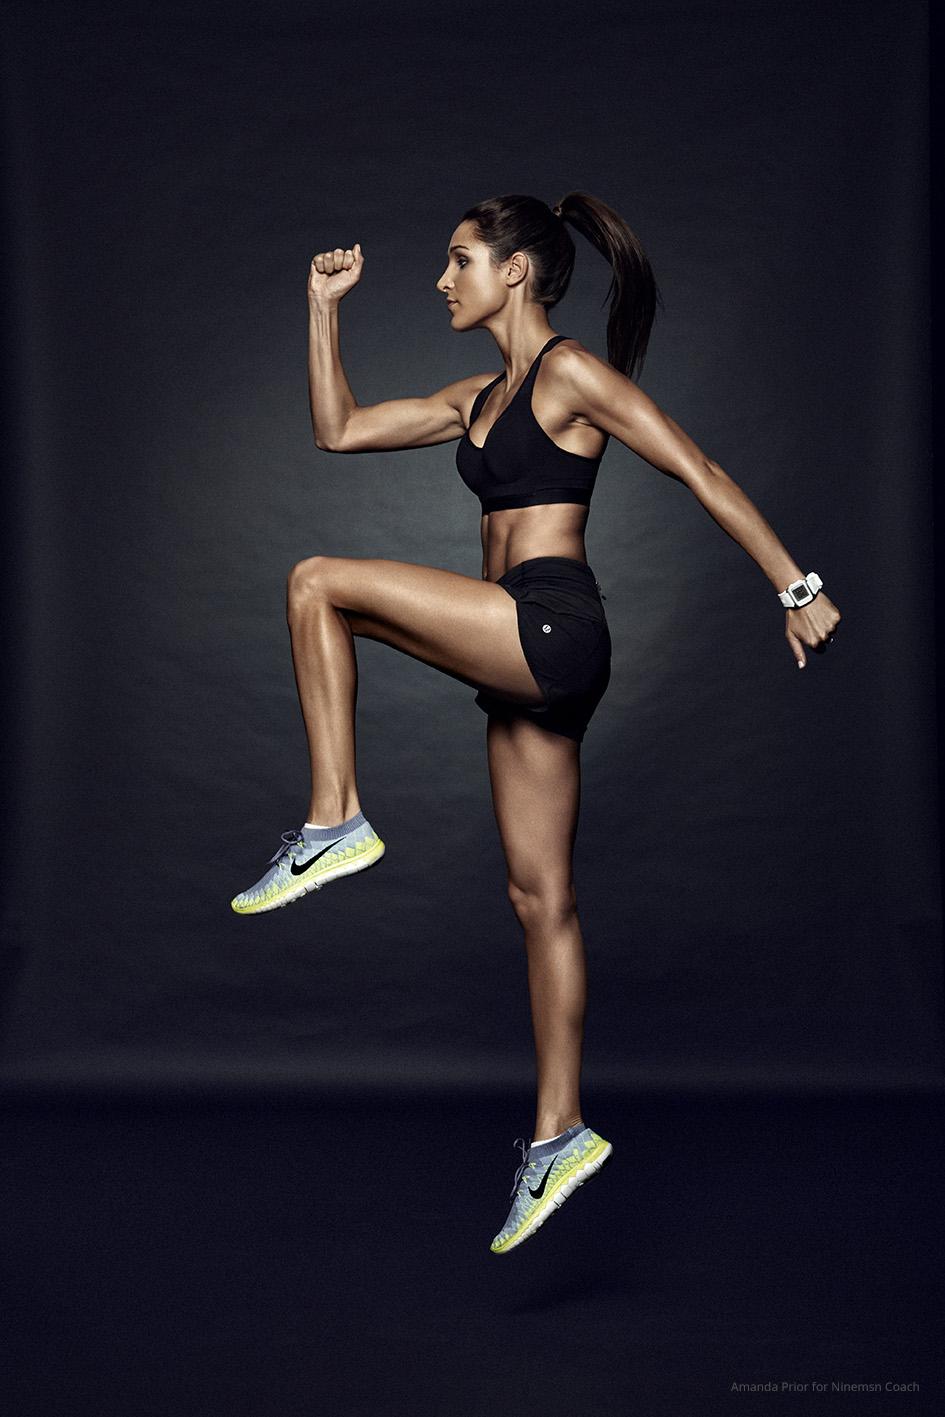 Kayla Itsines workout for Motto